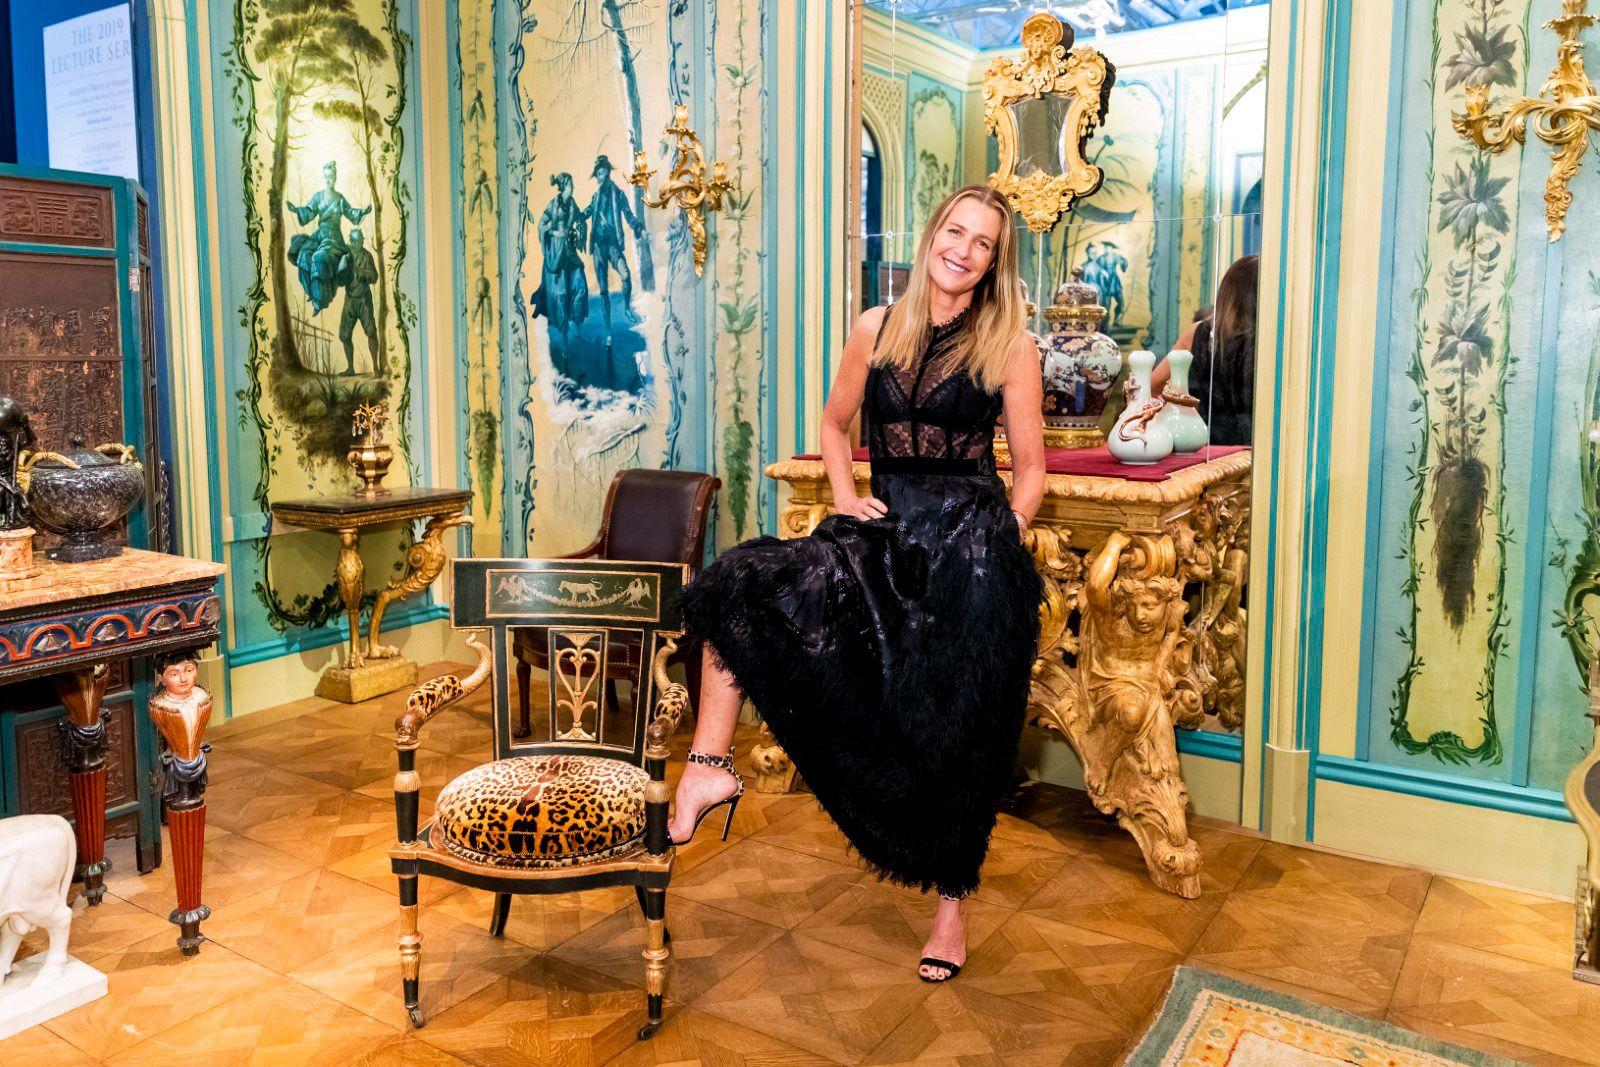 India Hicks Brings British Glam to San Francisco's Fall Show